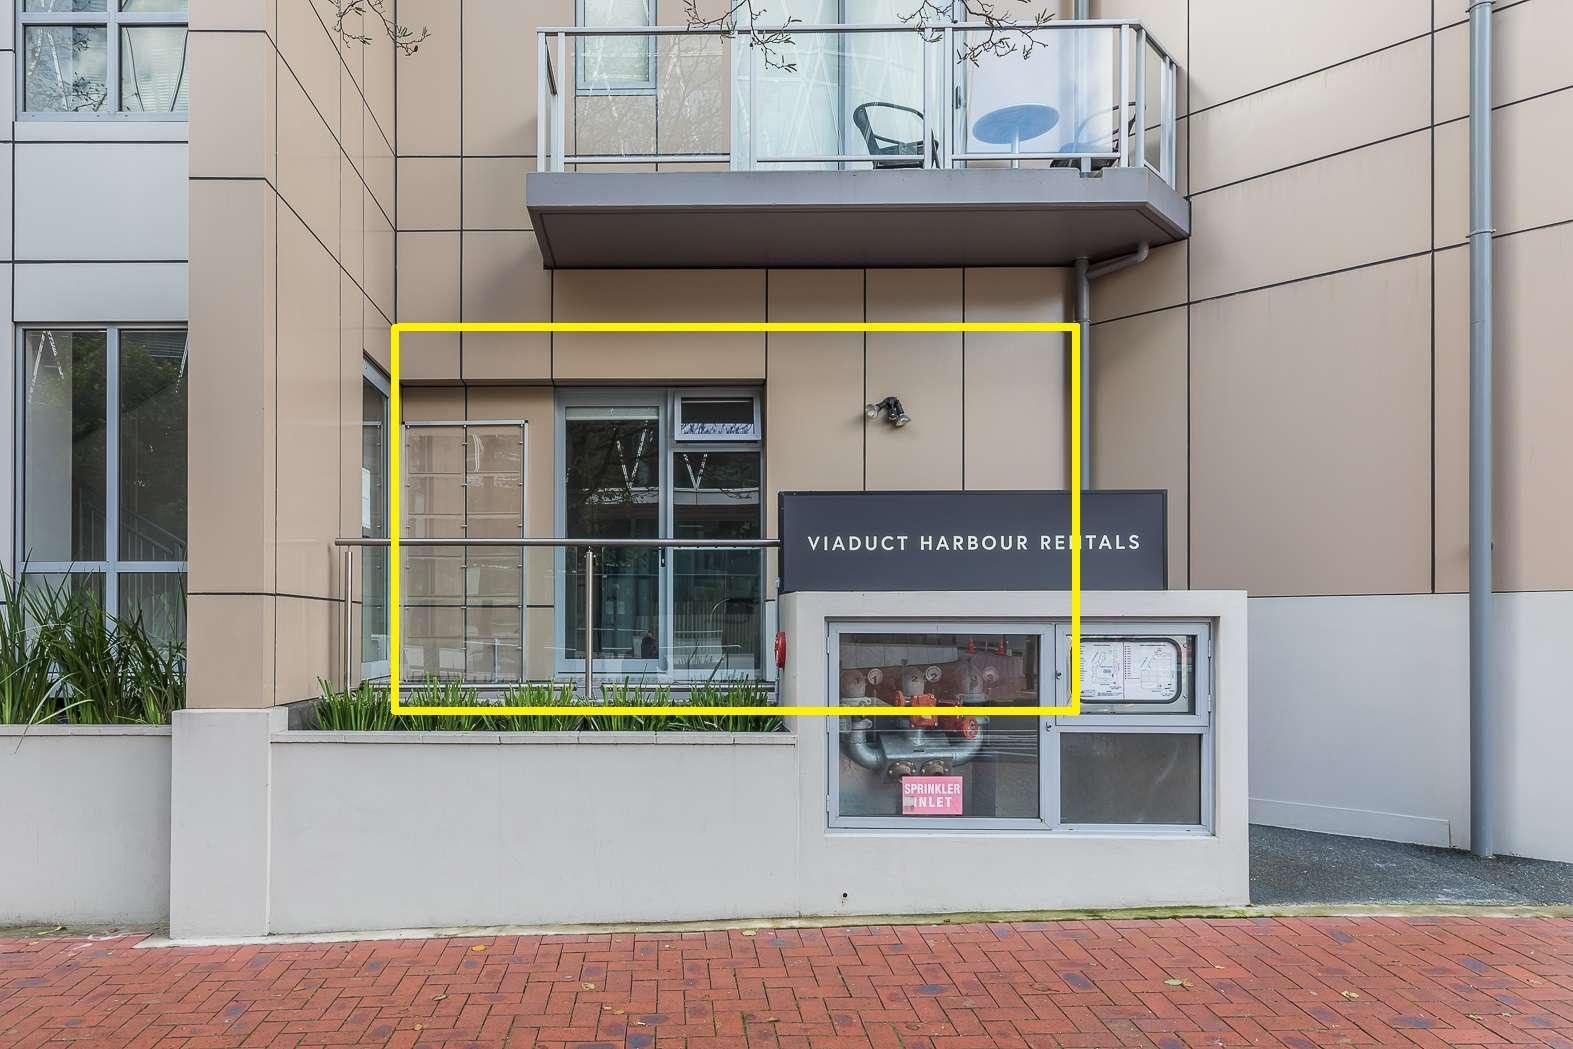 GO/16 Market Place, Auckland Central, Auckland City 1010